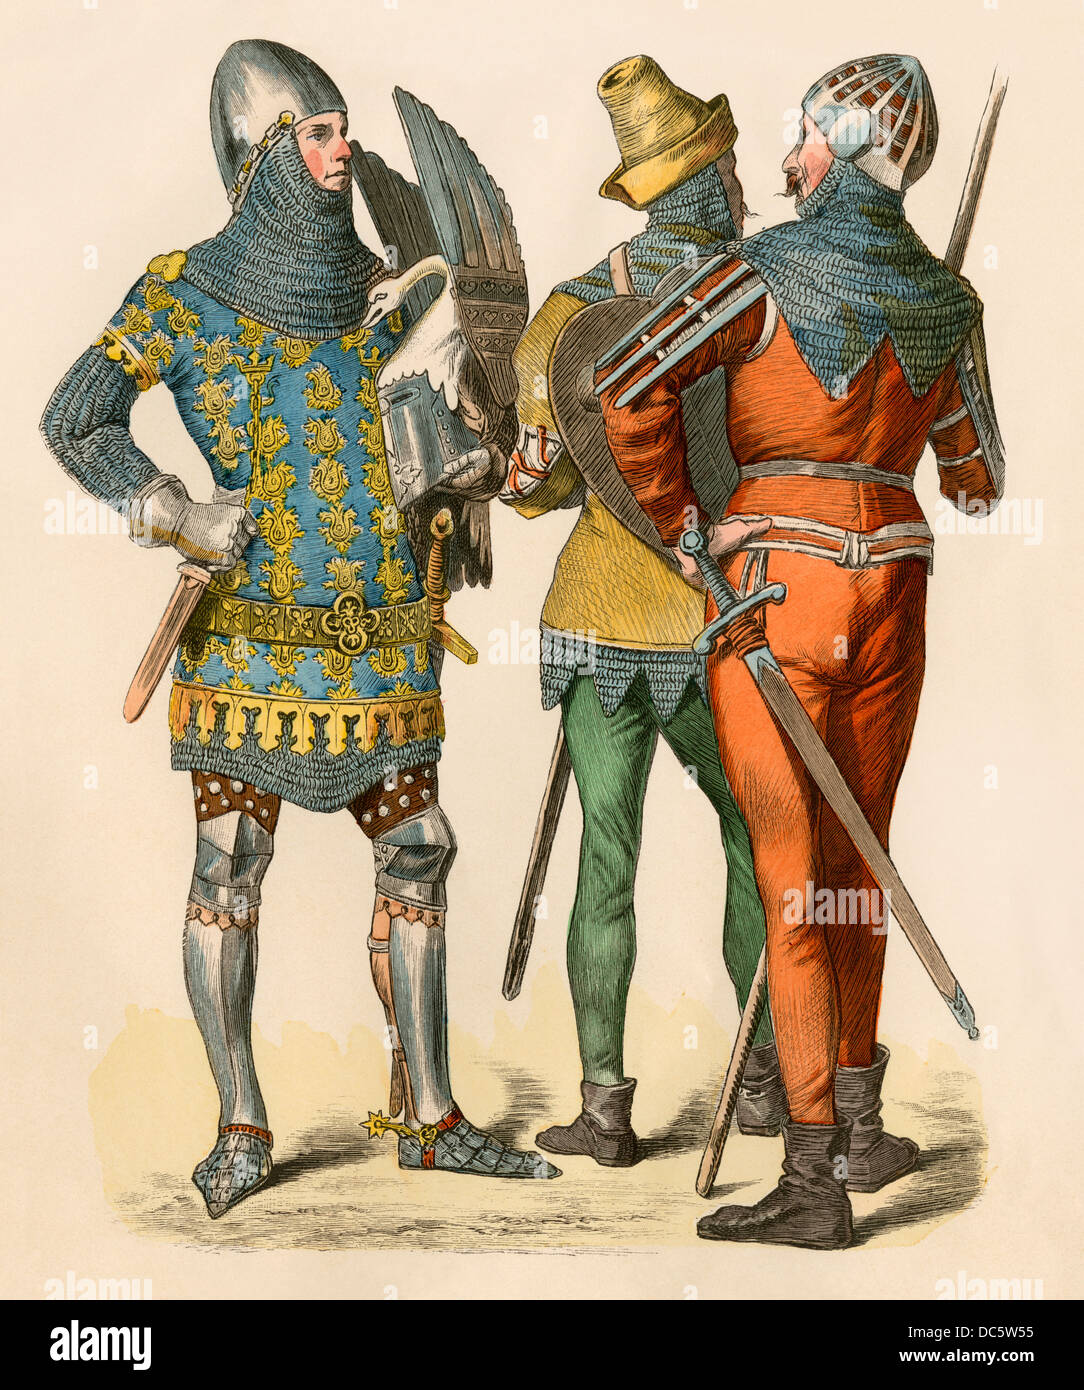 Rudolf von Sachsenhausen and fellow knights, 1300s. Hand-colored print - Stock Image